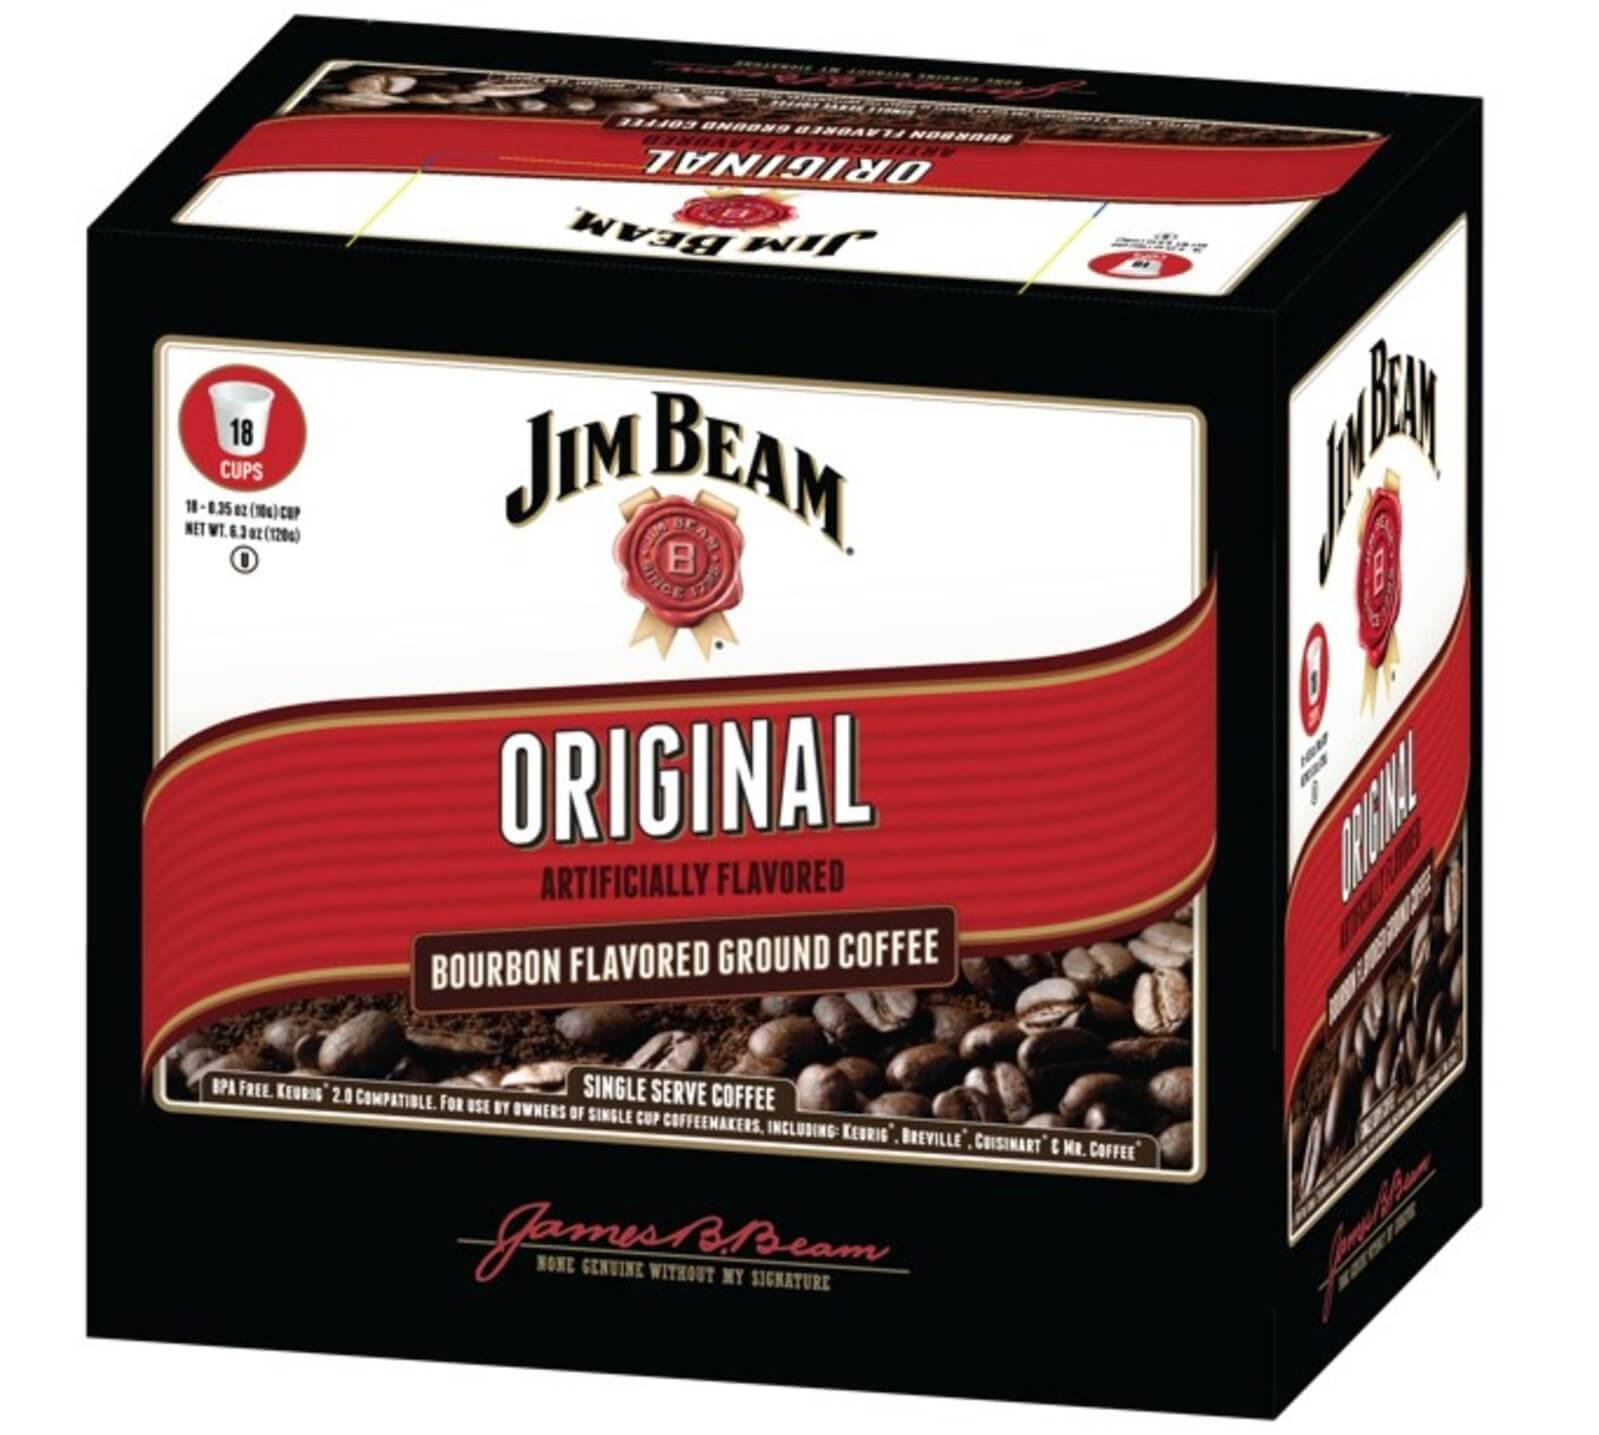 White Coffee Jim Beam Original flavor coffee - White Coffee Corporation